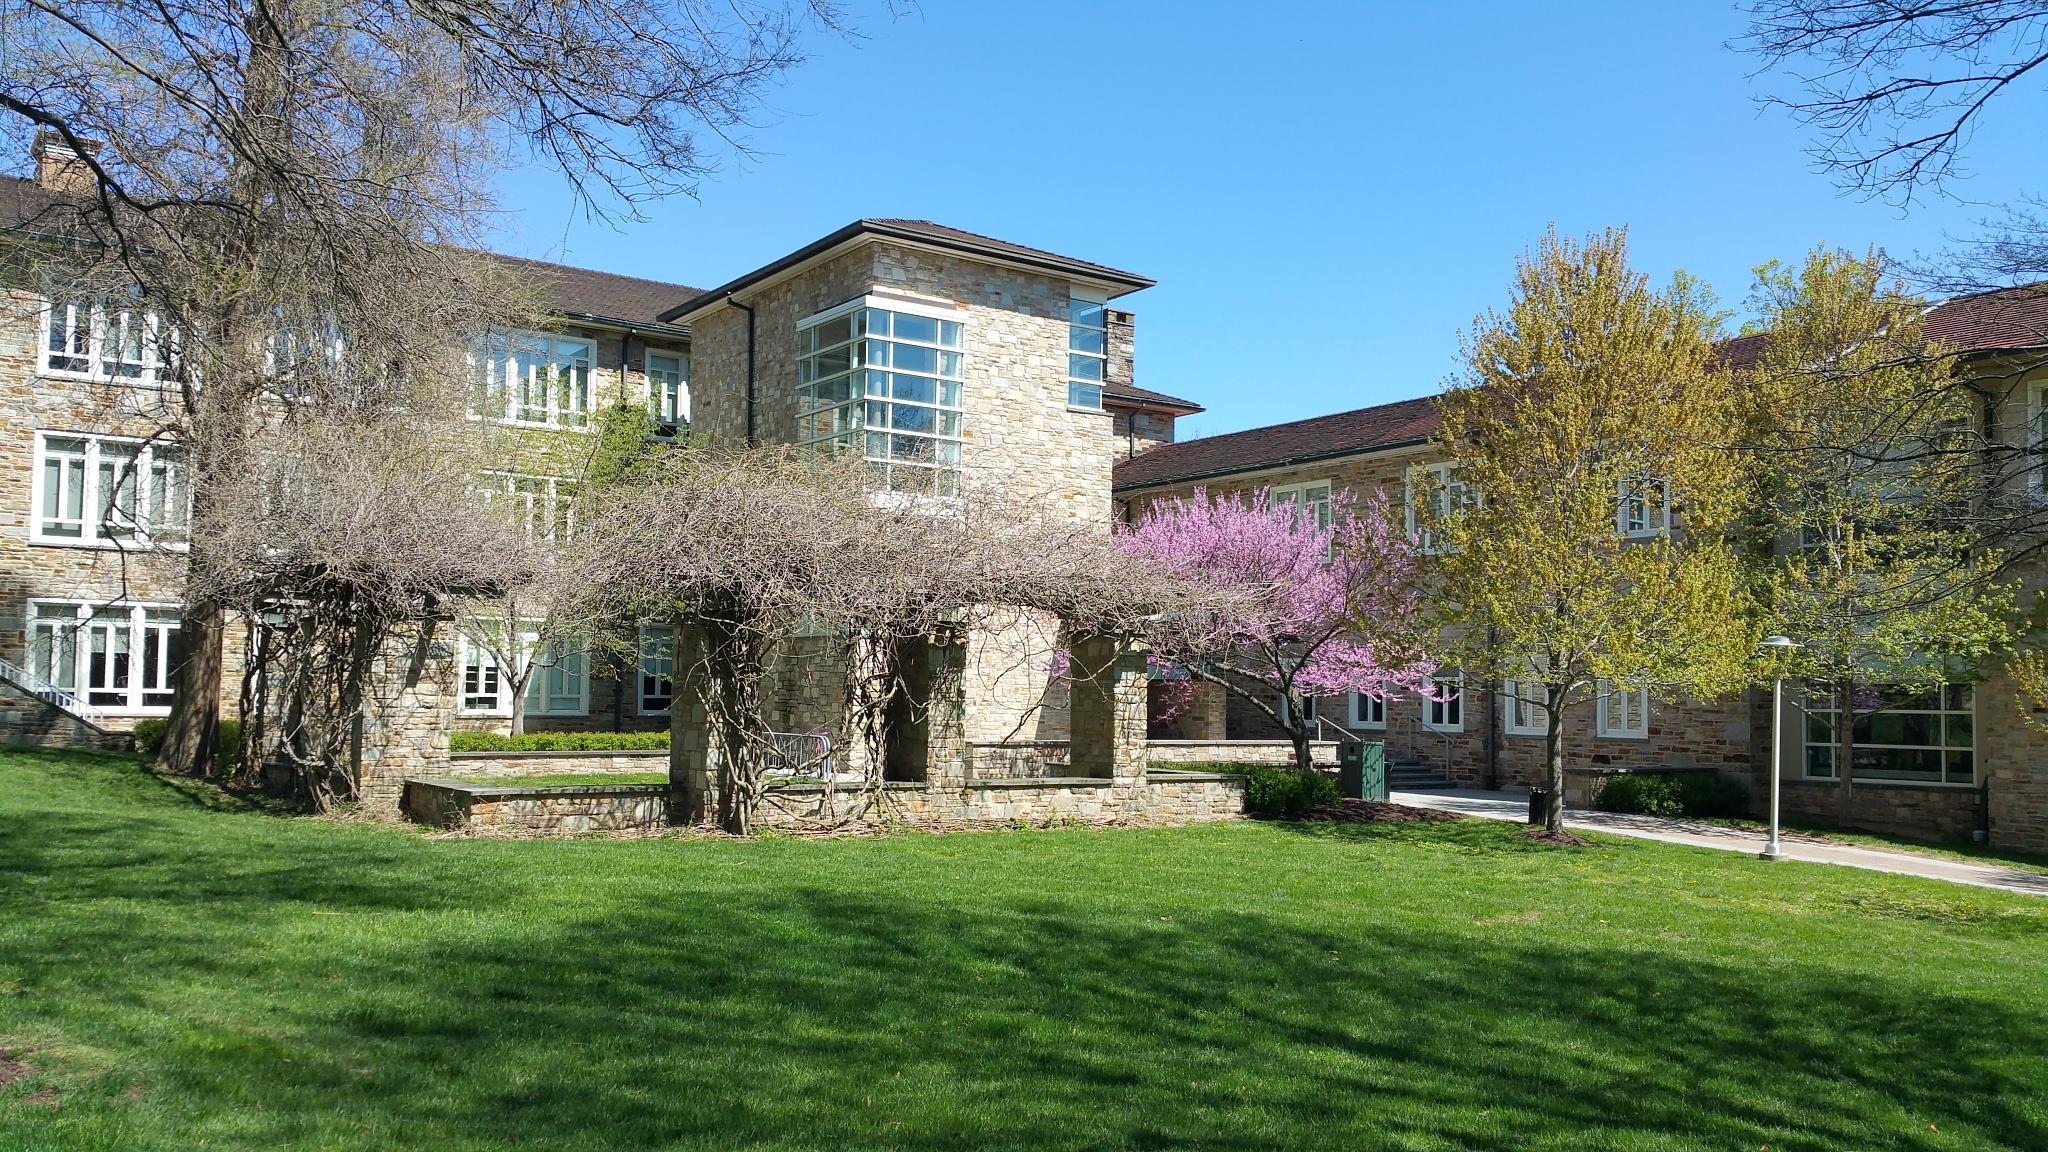 Faculdades-menos-seletivas-dos-EUA-Goucher-College